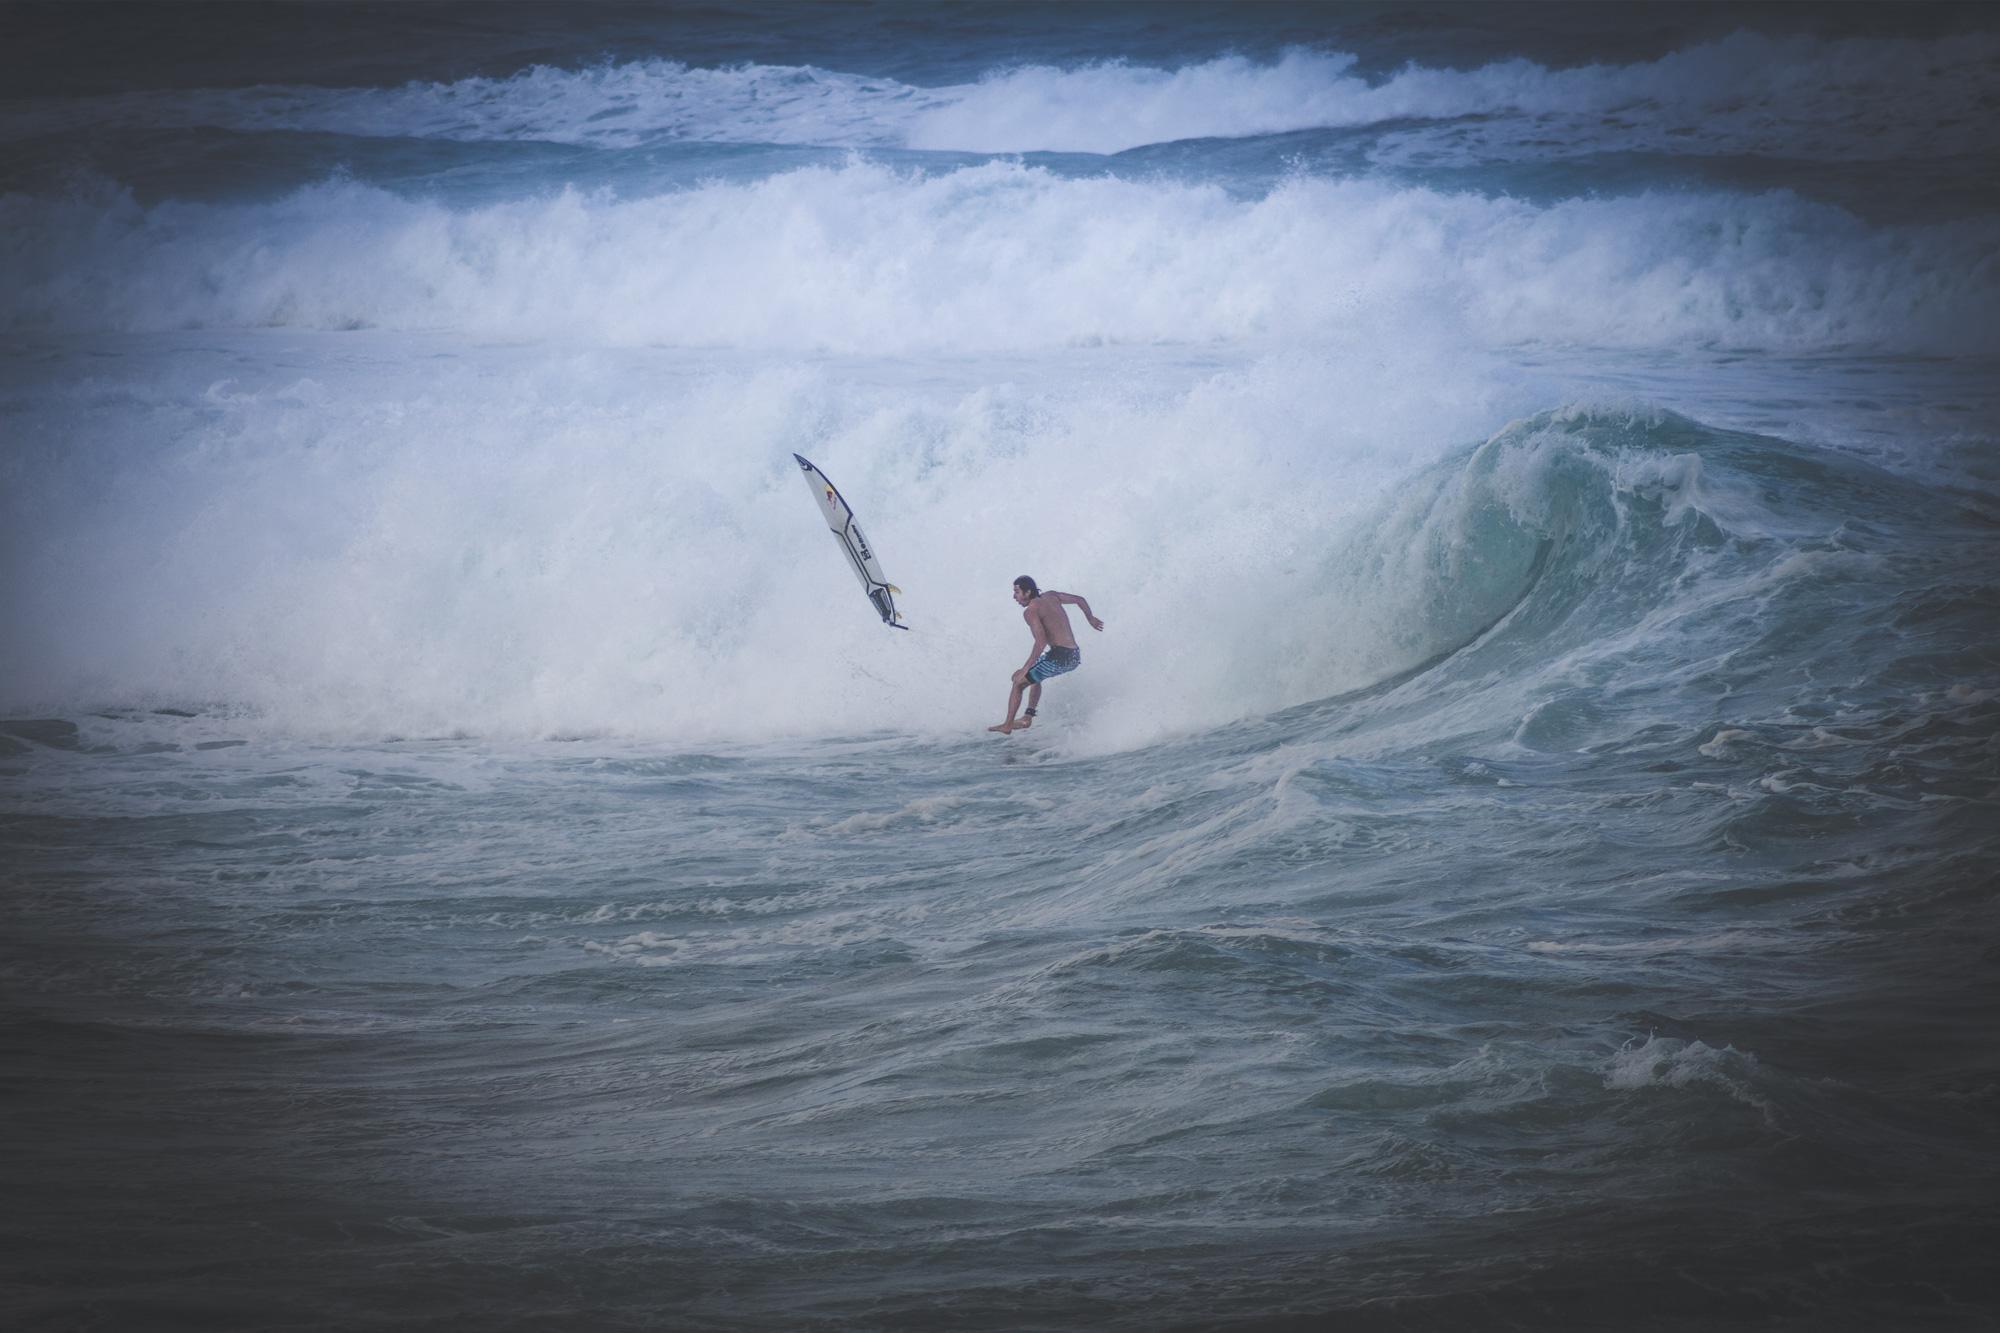 Big Swells, North Shore Oahu, Hawaii